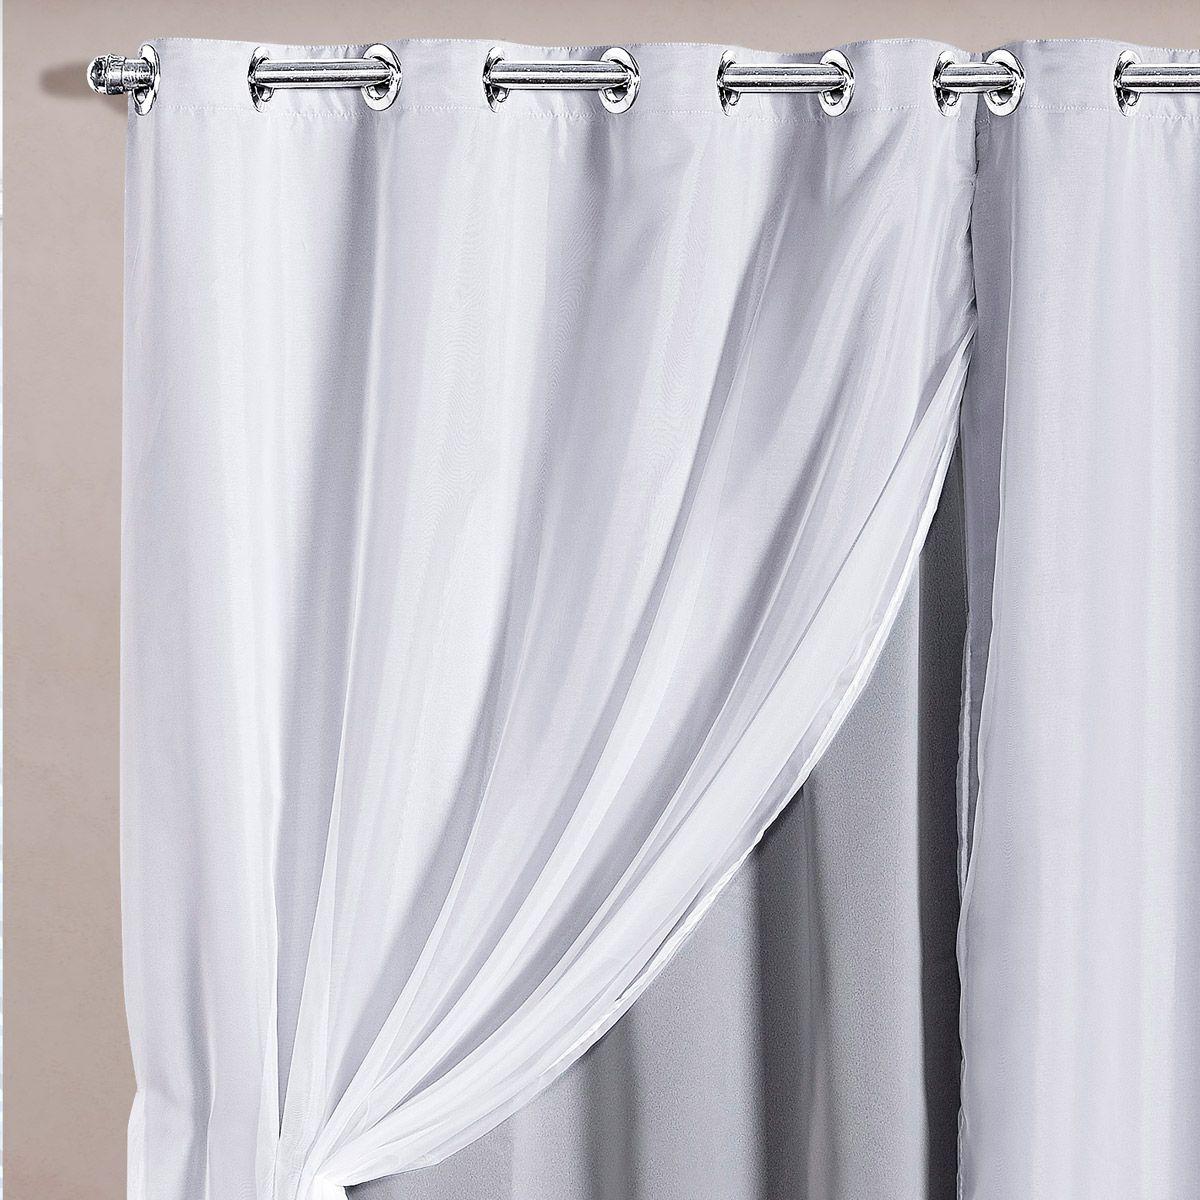 Cortina Blackout em Tecido Class c/ Voil Gelo/Branco Corta Luz 2,80m x 2,30m